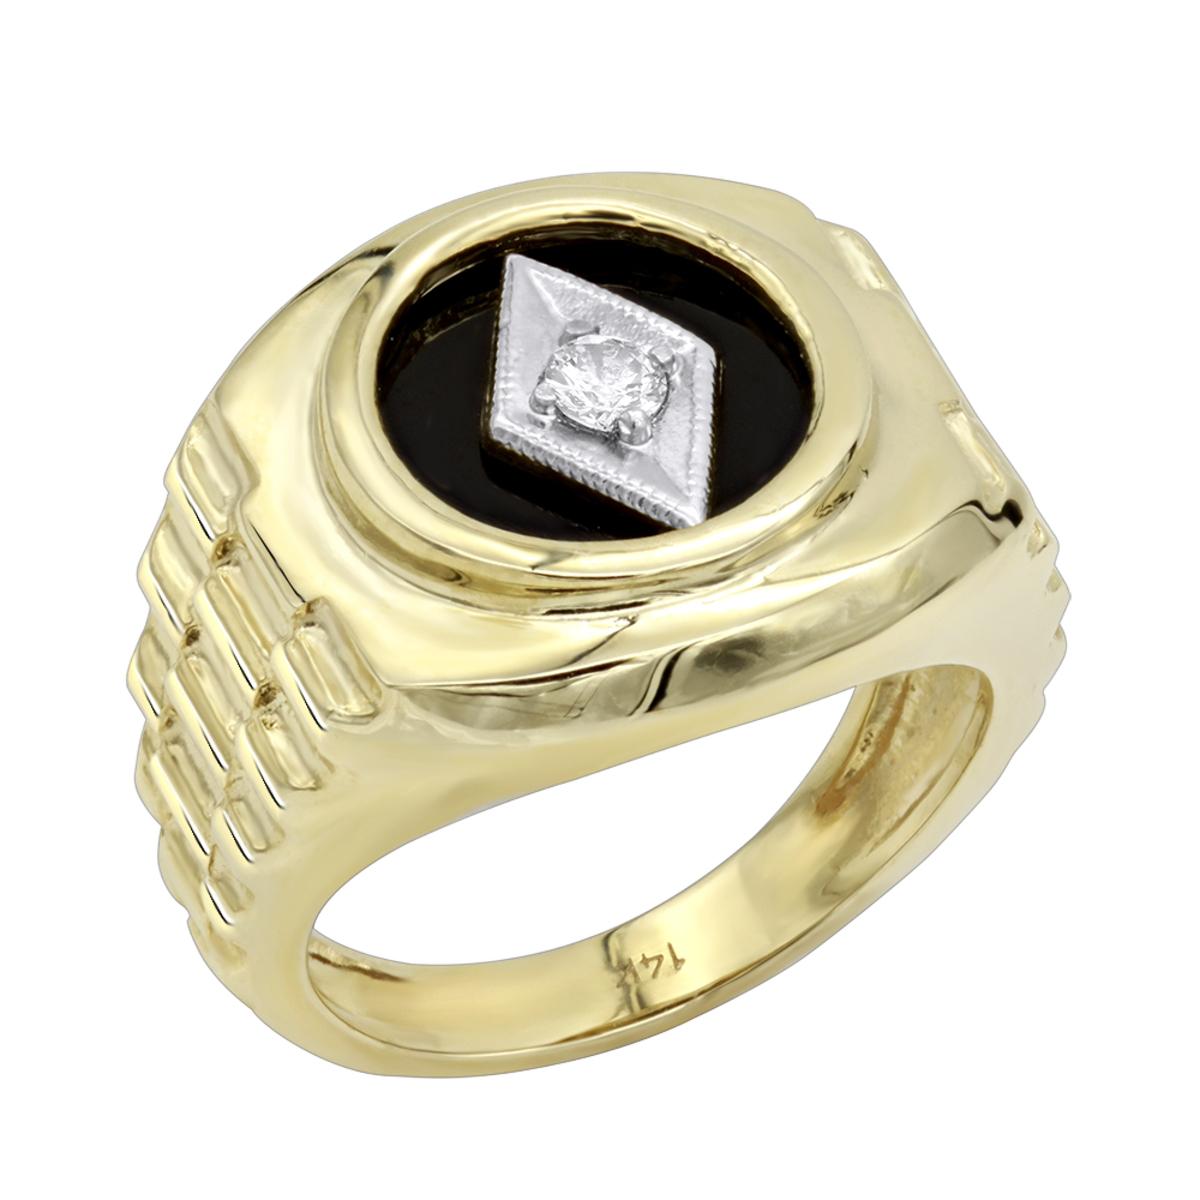 Black Onyx and Diamond Rings 14K Gold Diamond Ring 0.10